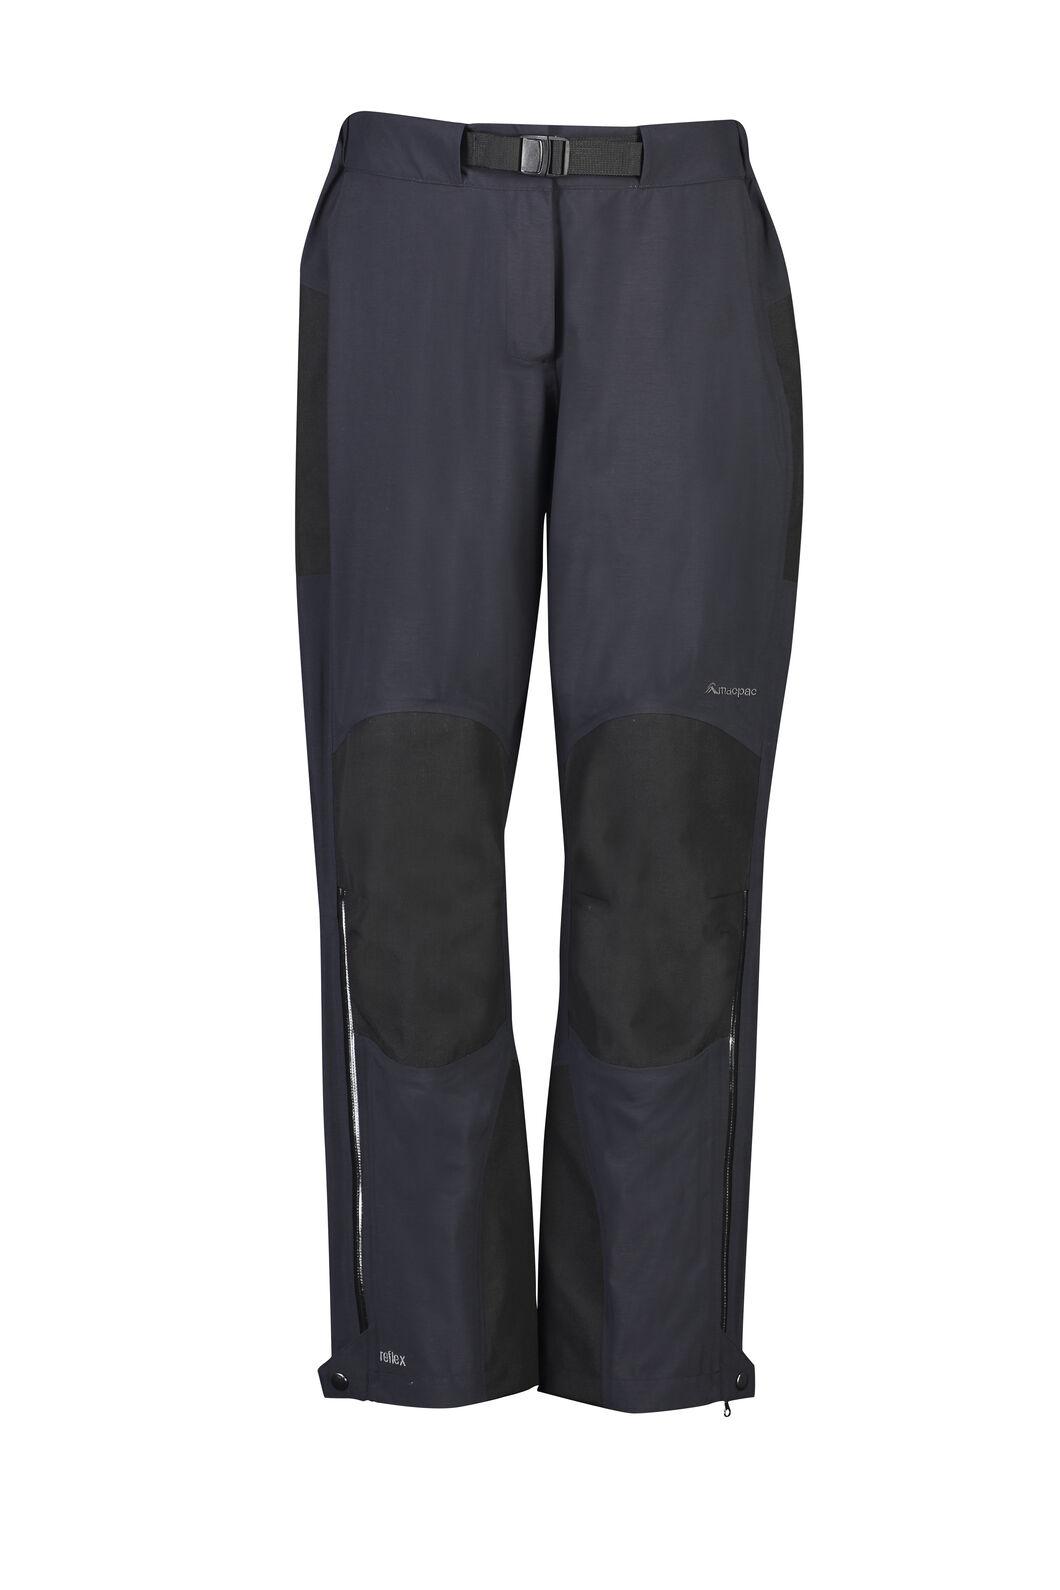 Macpac Gauge Reflex™ Rain Pants — Women's, Black, hi-res